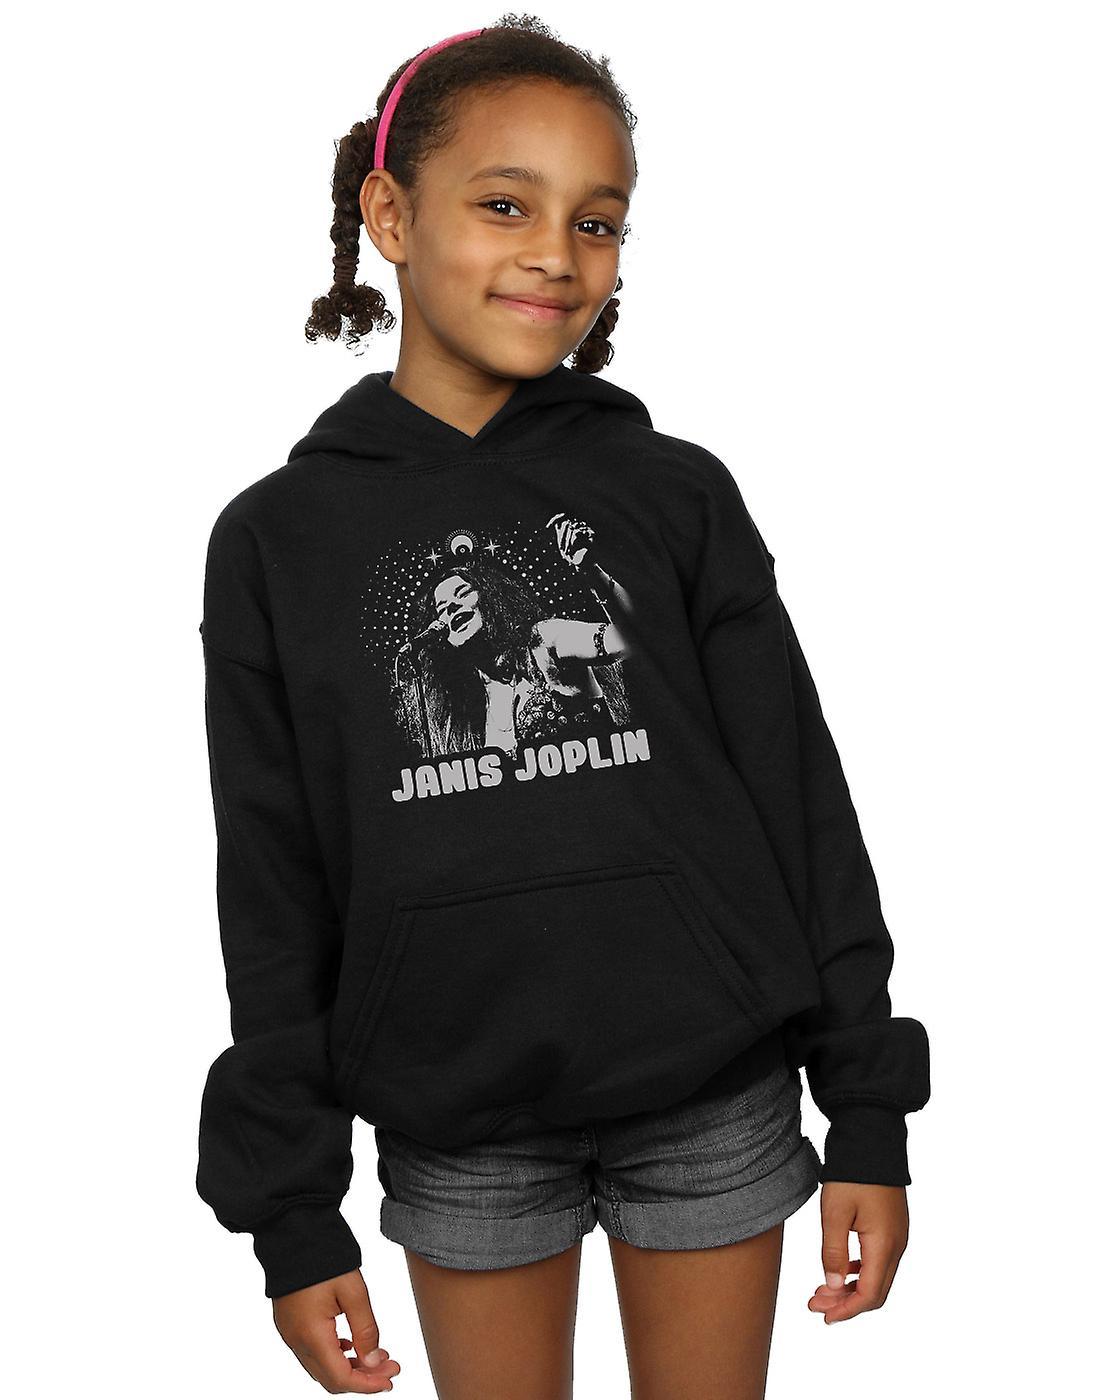 Janis Joplin Girls Spiritual Mono Hoodie